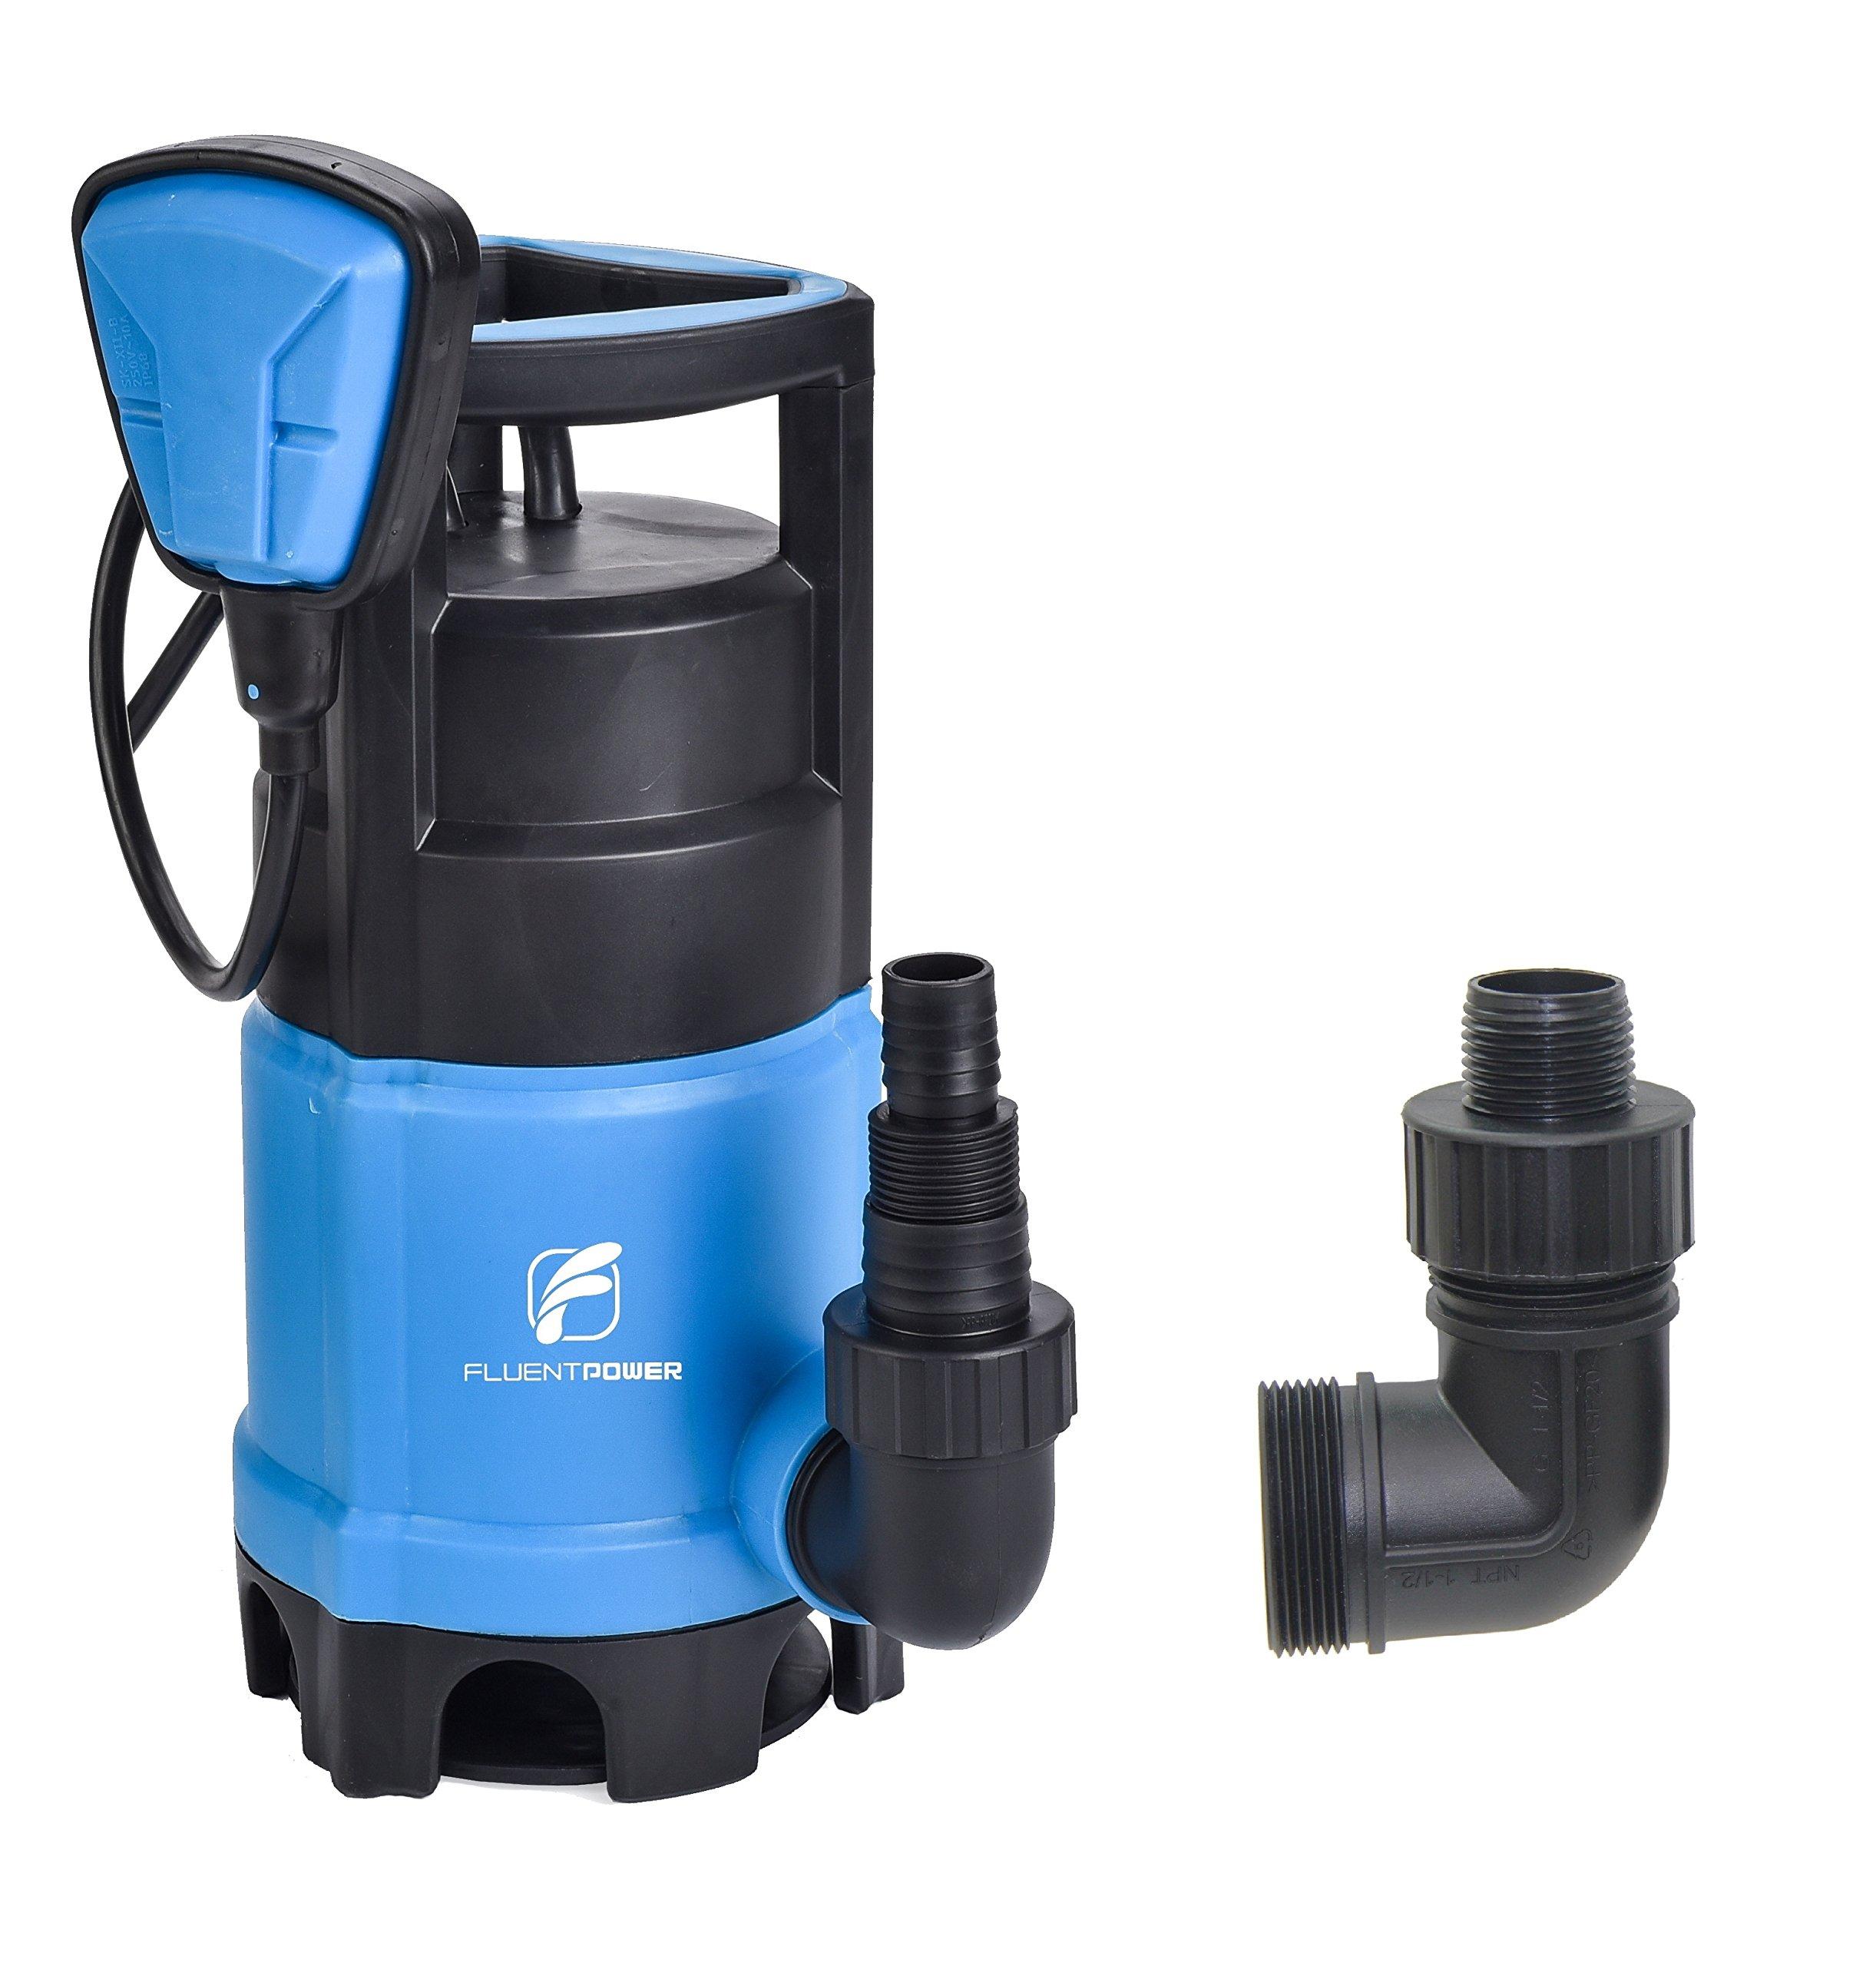 FLUENT POWER Sump Pump - 110V/60Hz 3/4HP 3300 GPH Clean / Dirty Submersible Pump for Pool and Flood drain